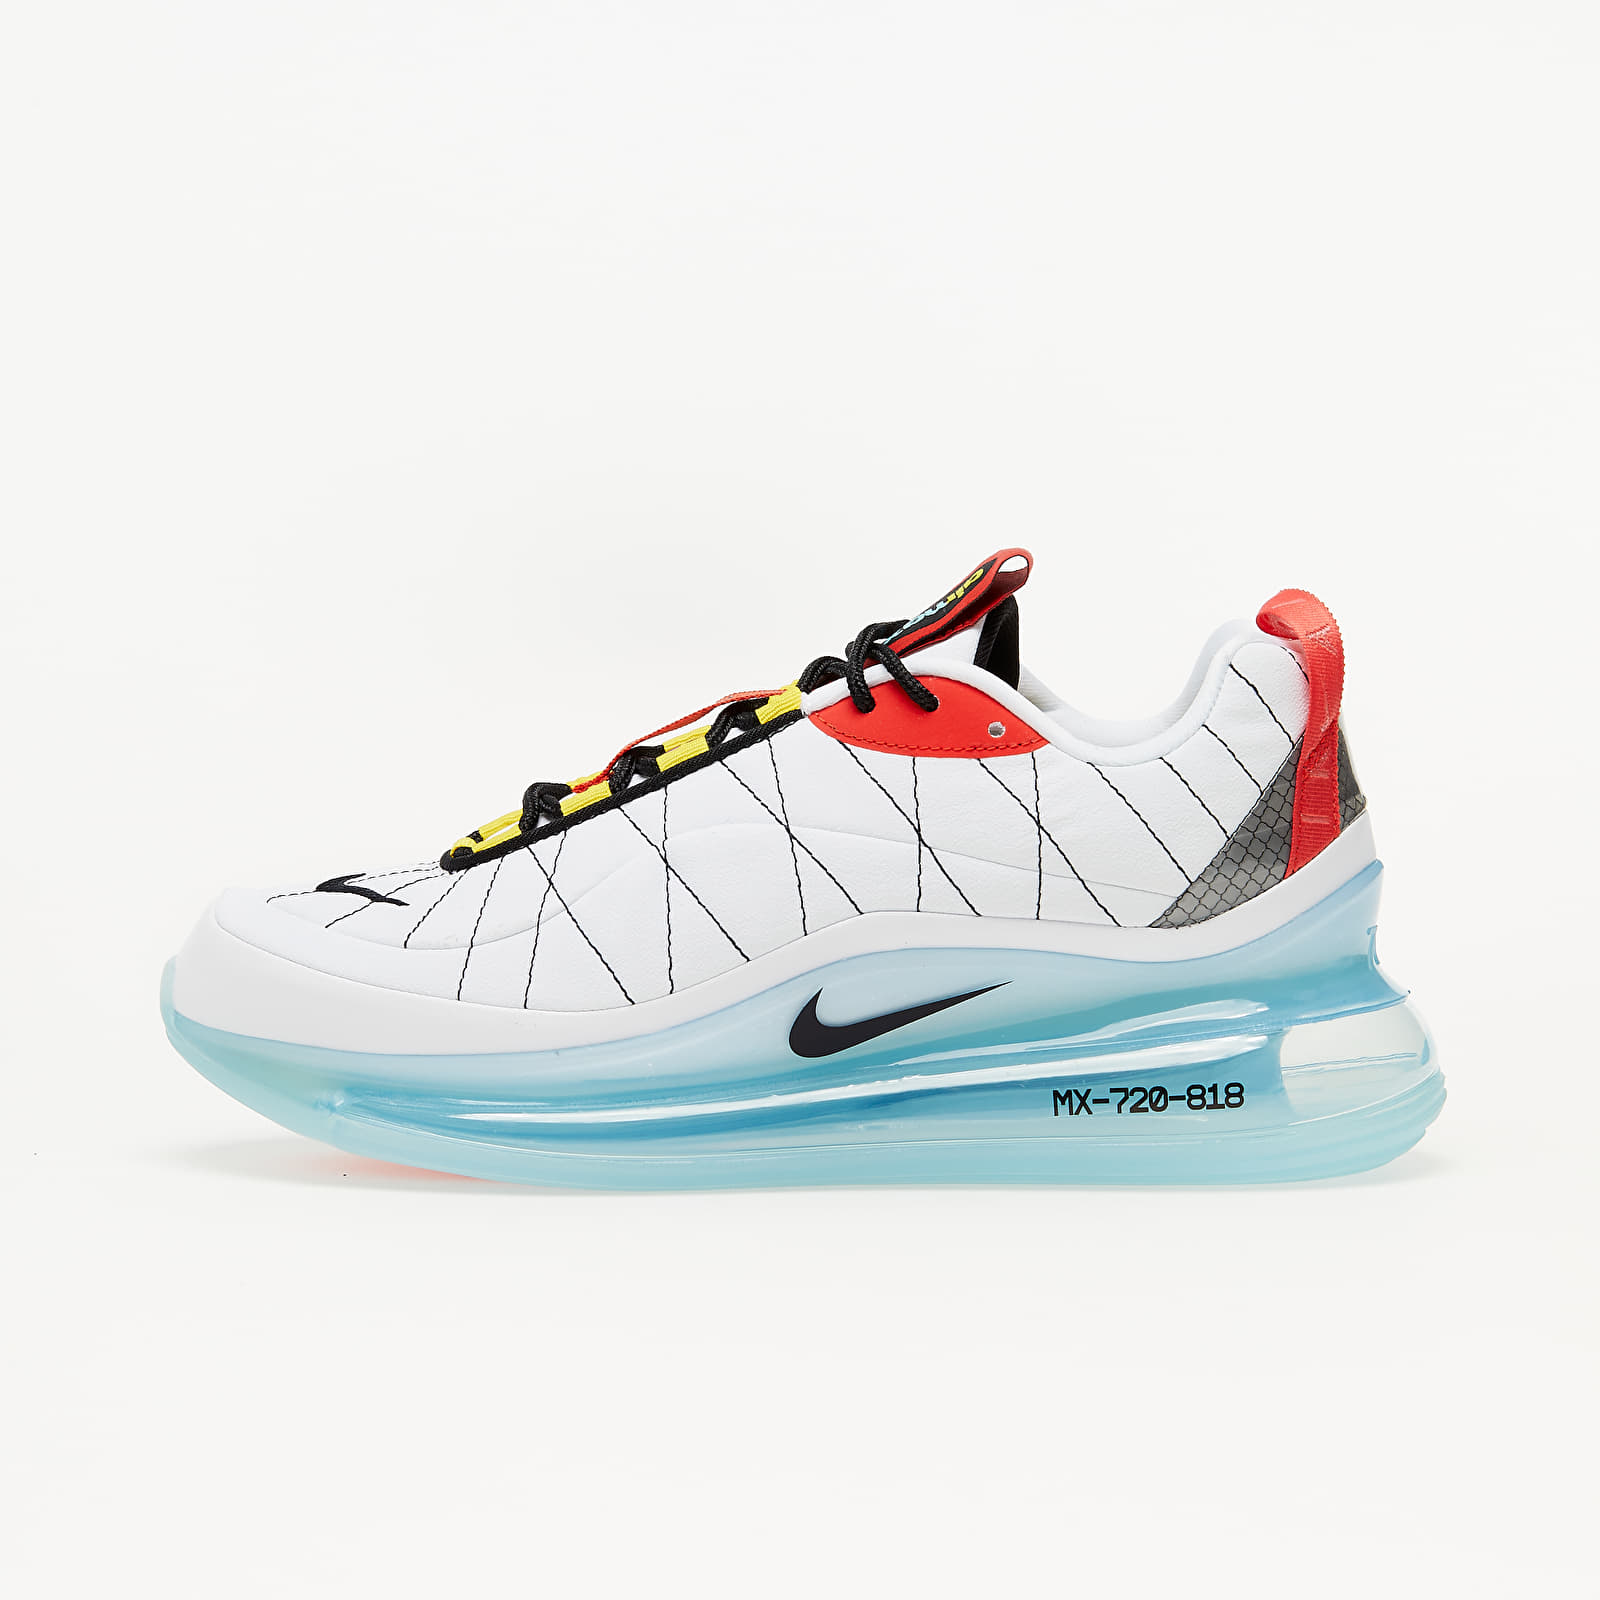 Nike MX-720-818 White/ Black-Speed Yellow-Chile Red EUR 42.5